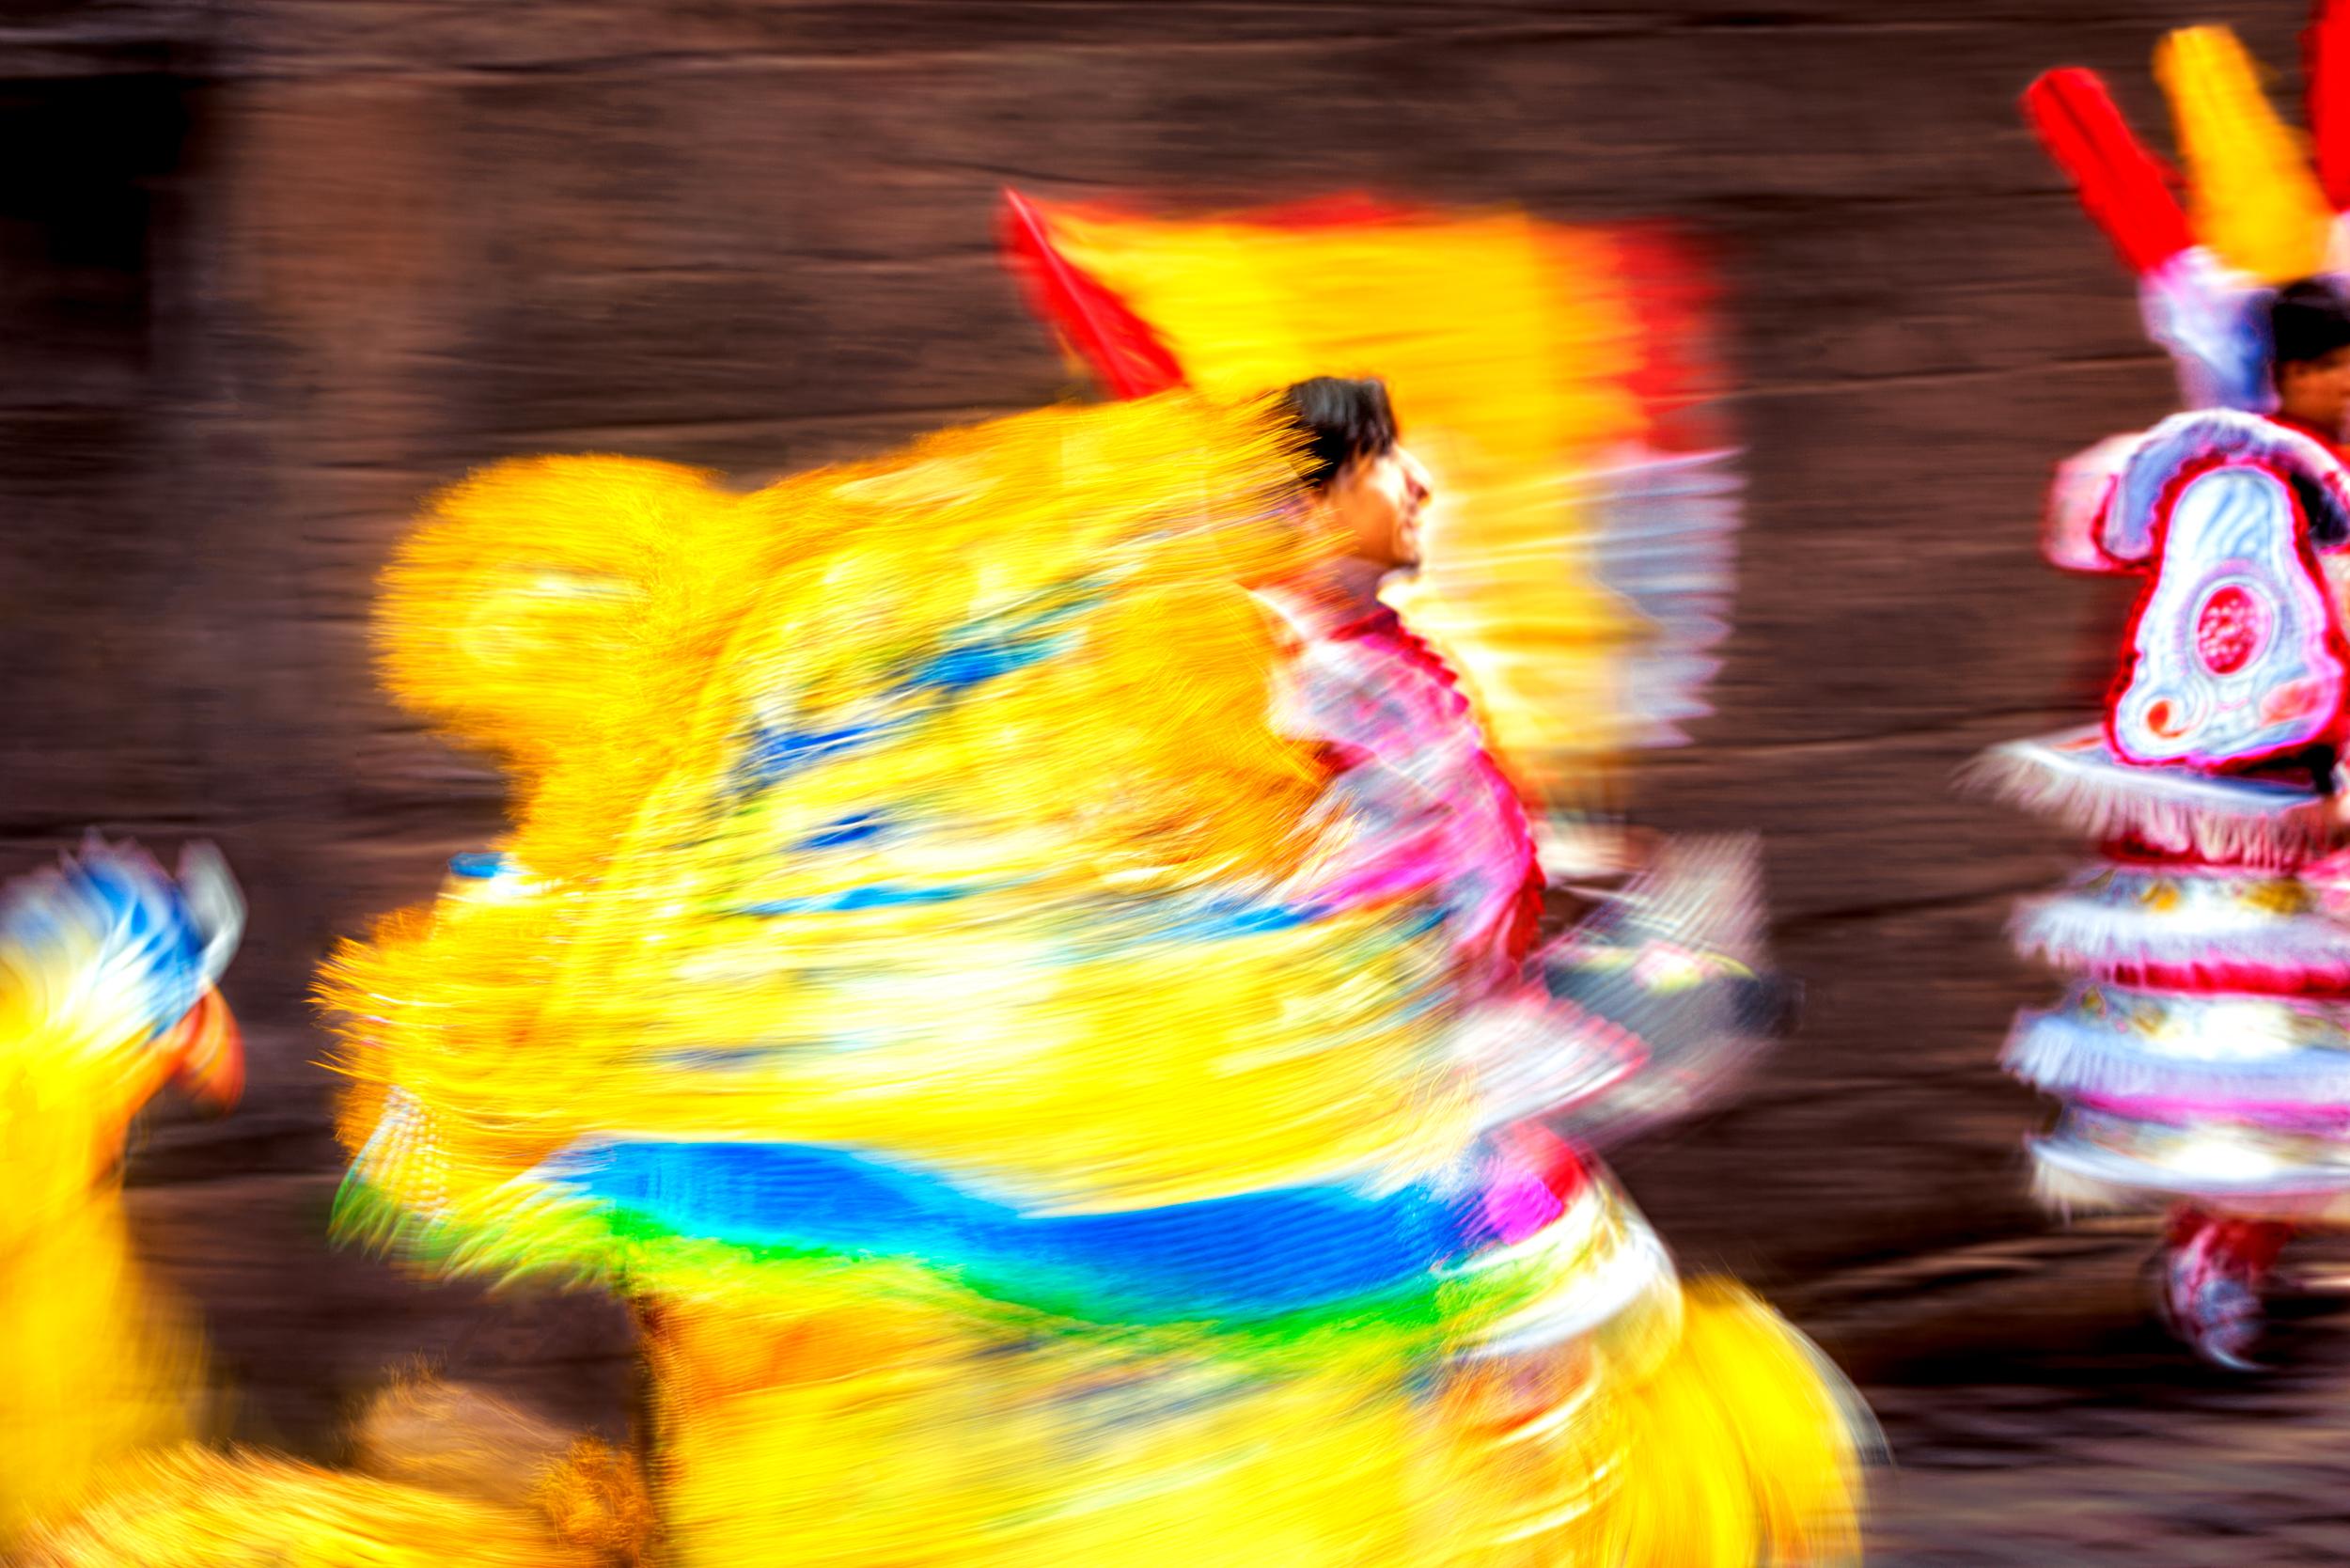 Spyrides_Kyle_Peruvian_Festival_1_DSC4817 copy.jpg